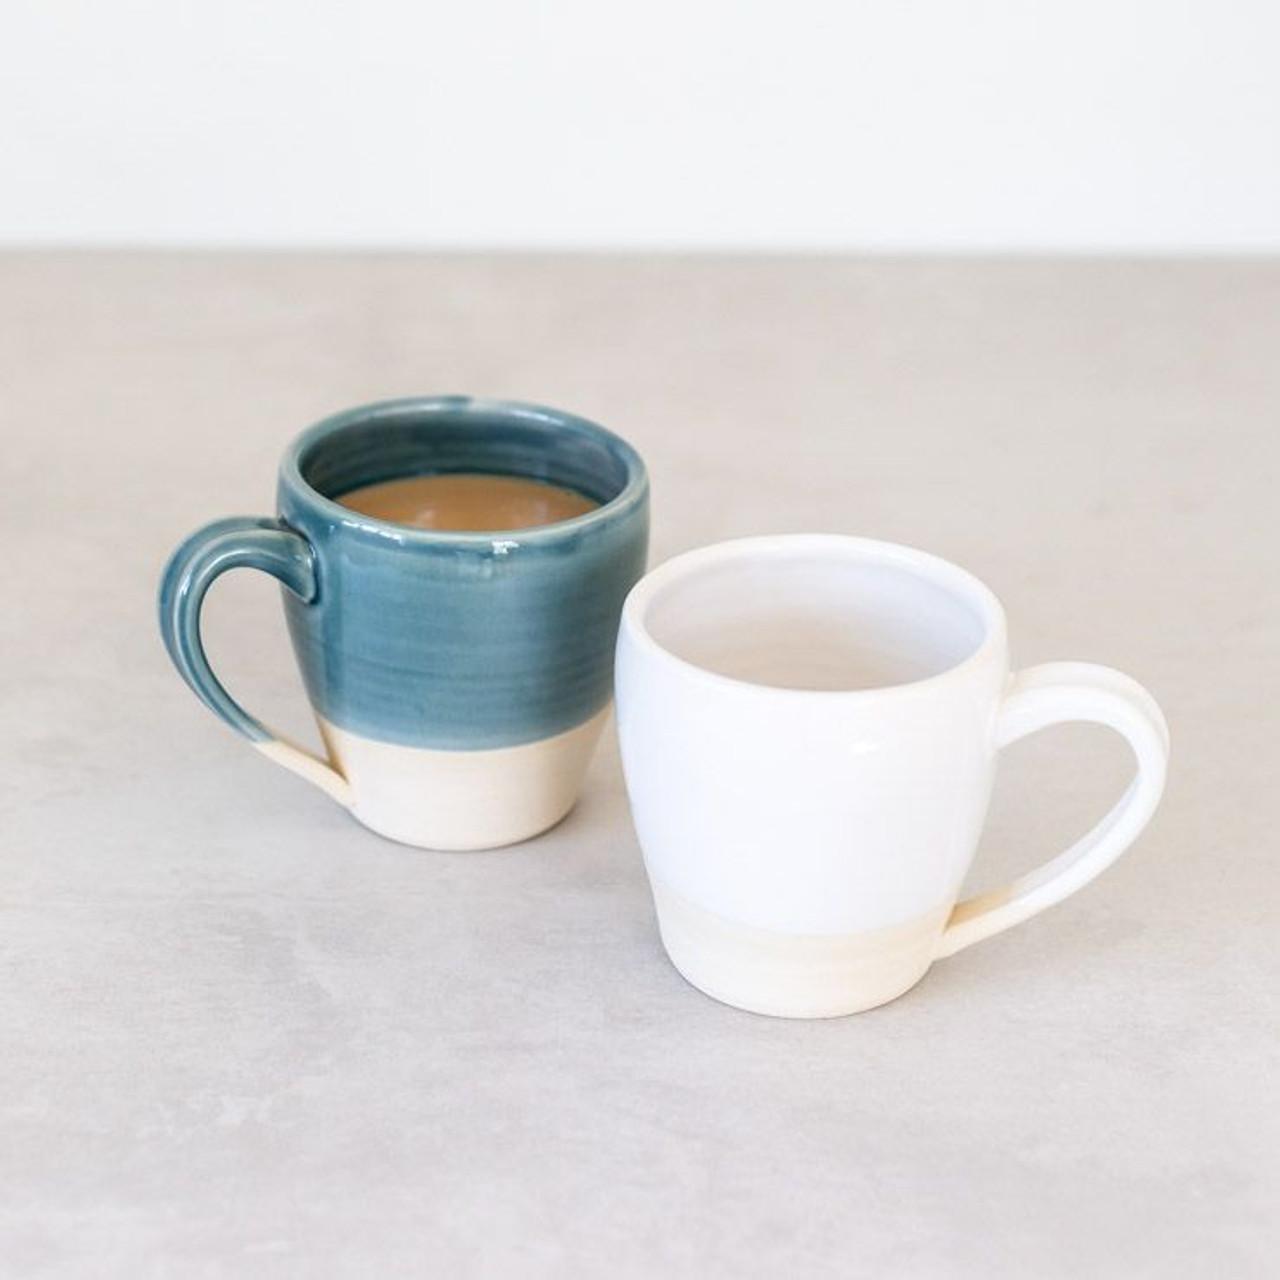 Handmade Ceramic Mug In Pastel Two Tone By Lafayette Avenue